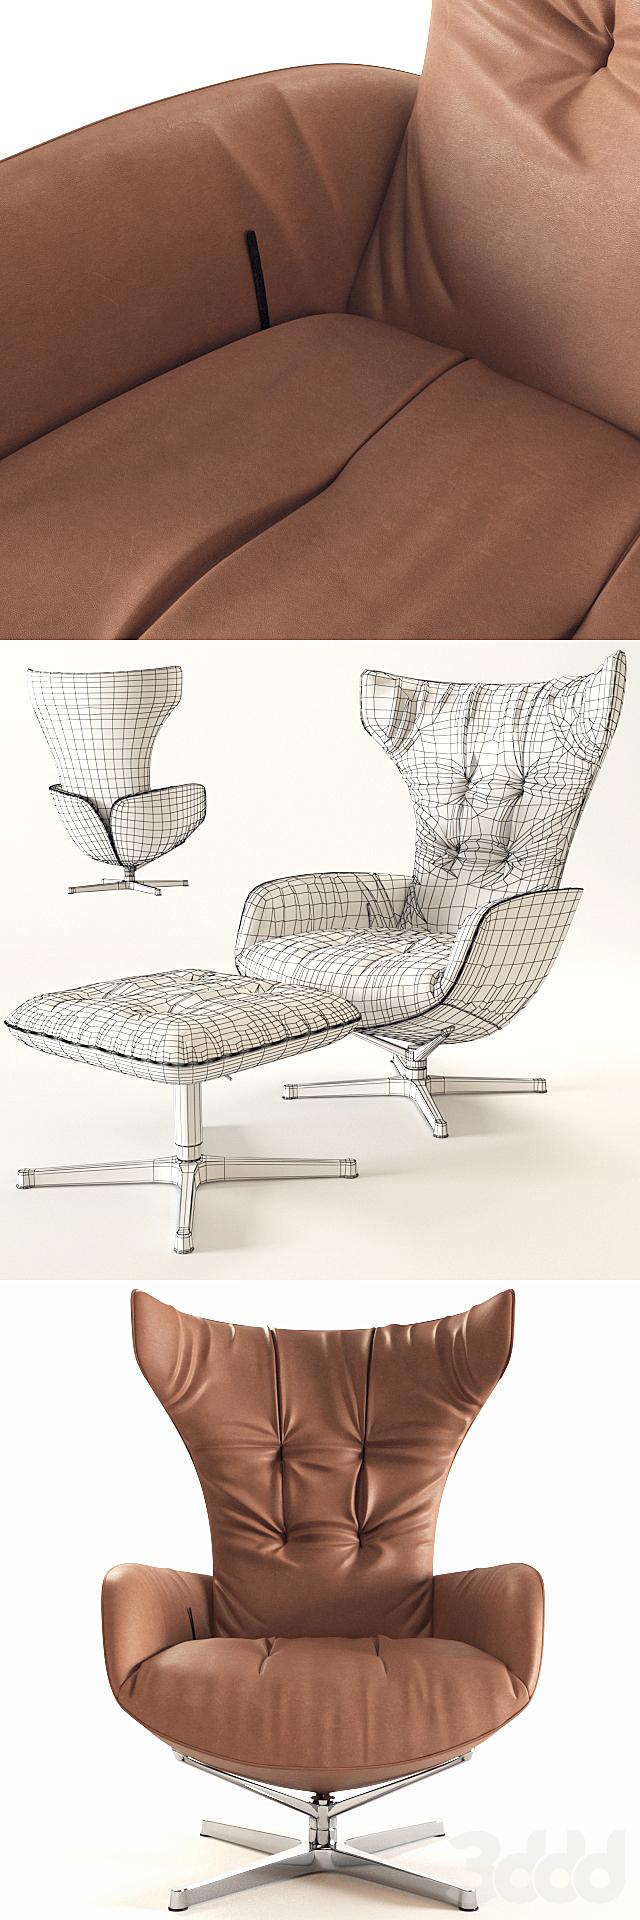 Onsa Chair Walter Knoll(vray GGX)